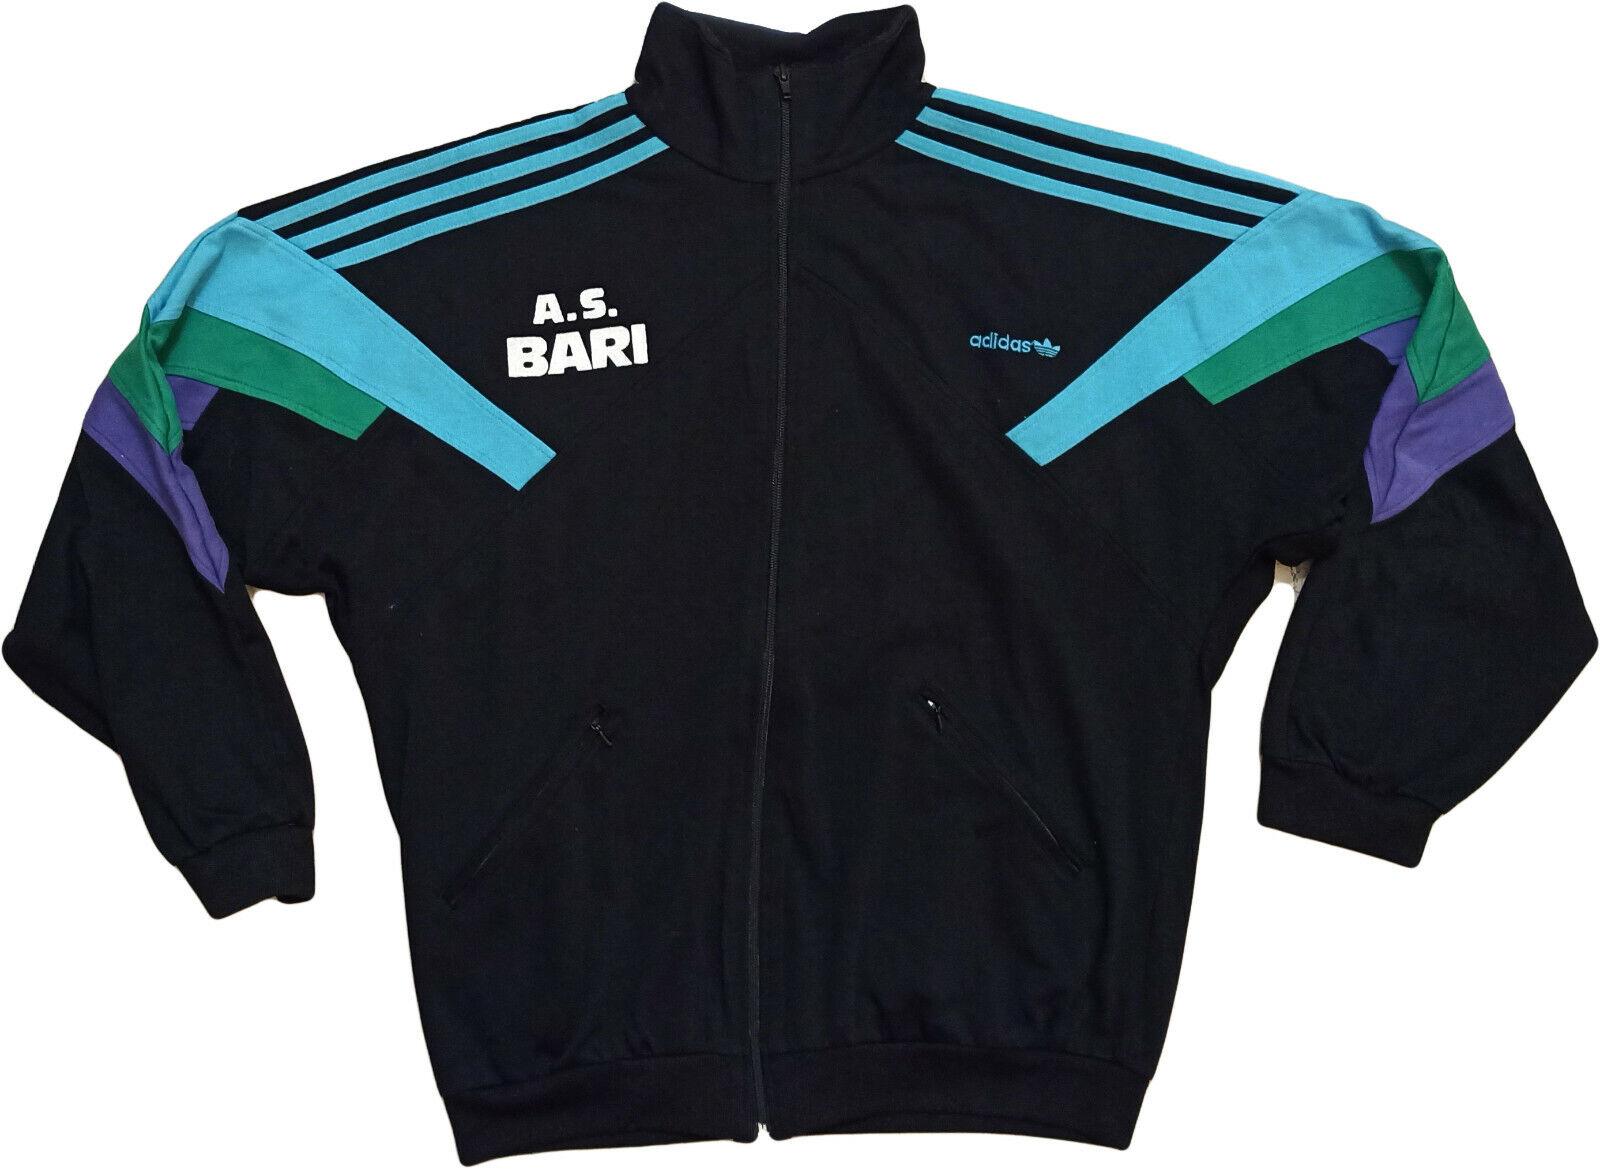 Maglia adidas vintage Bari home jersey 1994 1995 tracktop SUD FACTORING Diuominiione L